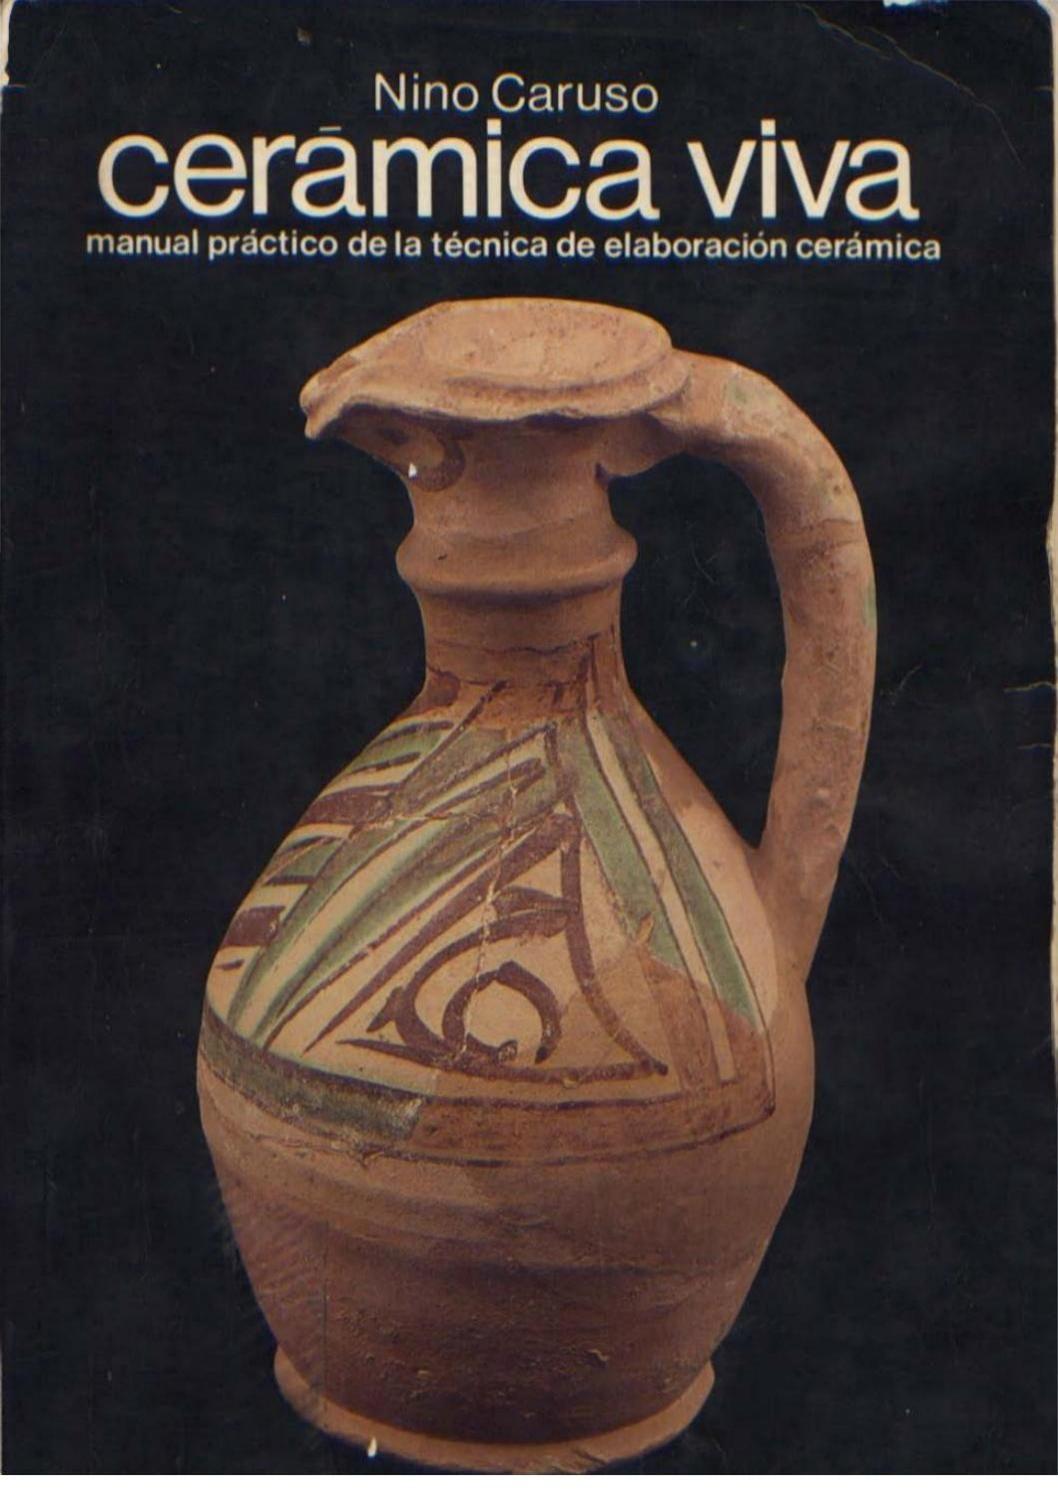 Ceramica Viva Nino Caruso.Ceramica Viva Nino Caruso Ceramic Sculpture Ceramica Alfareria